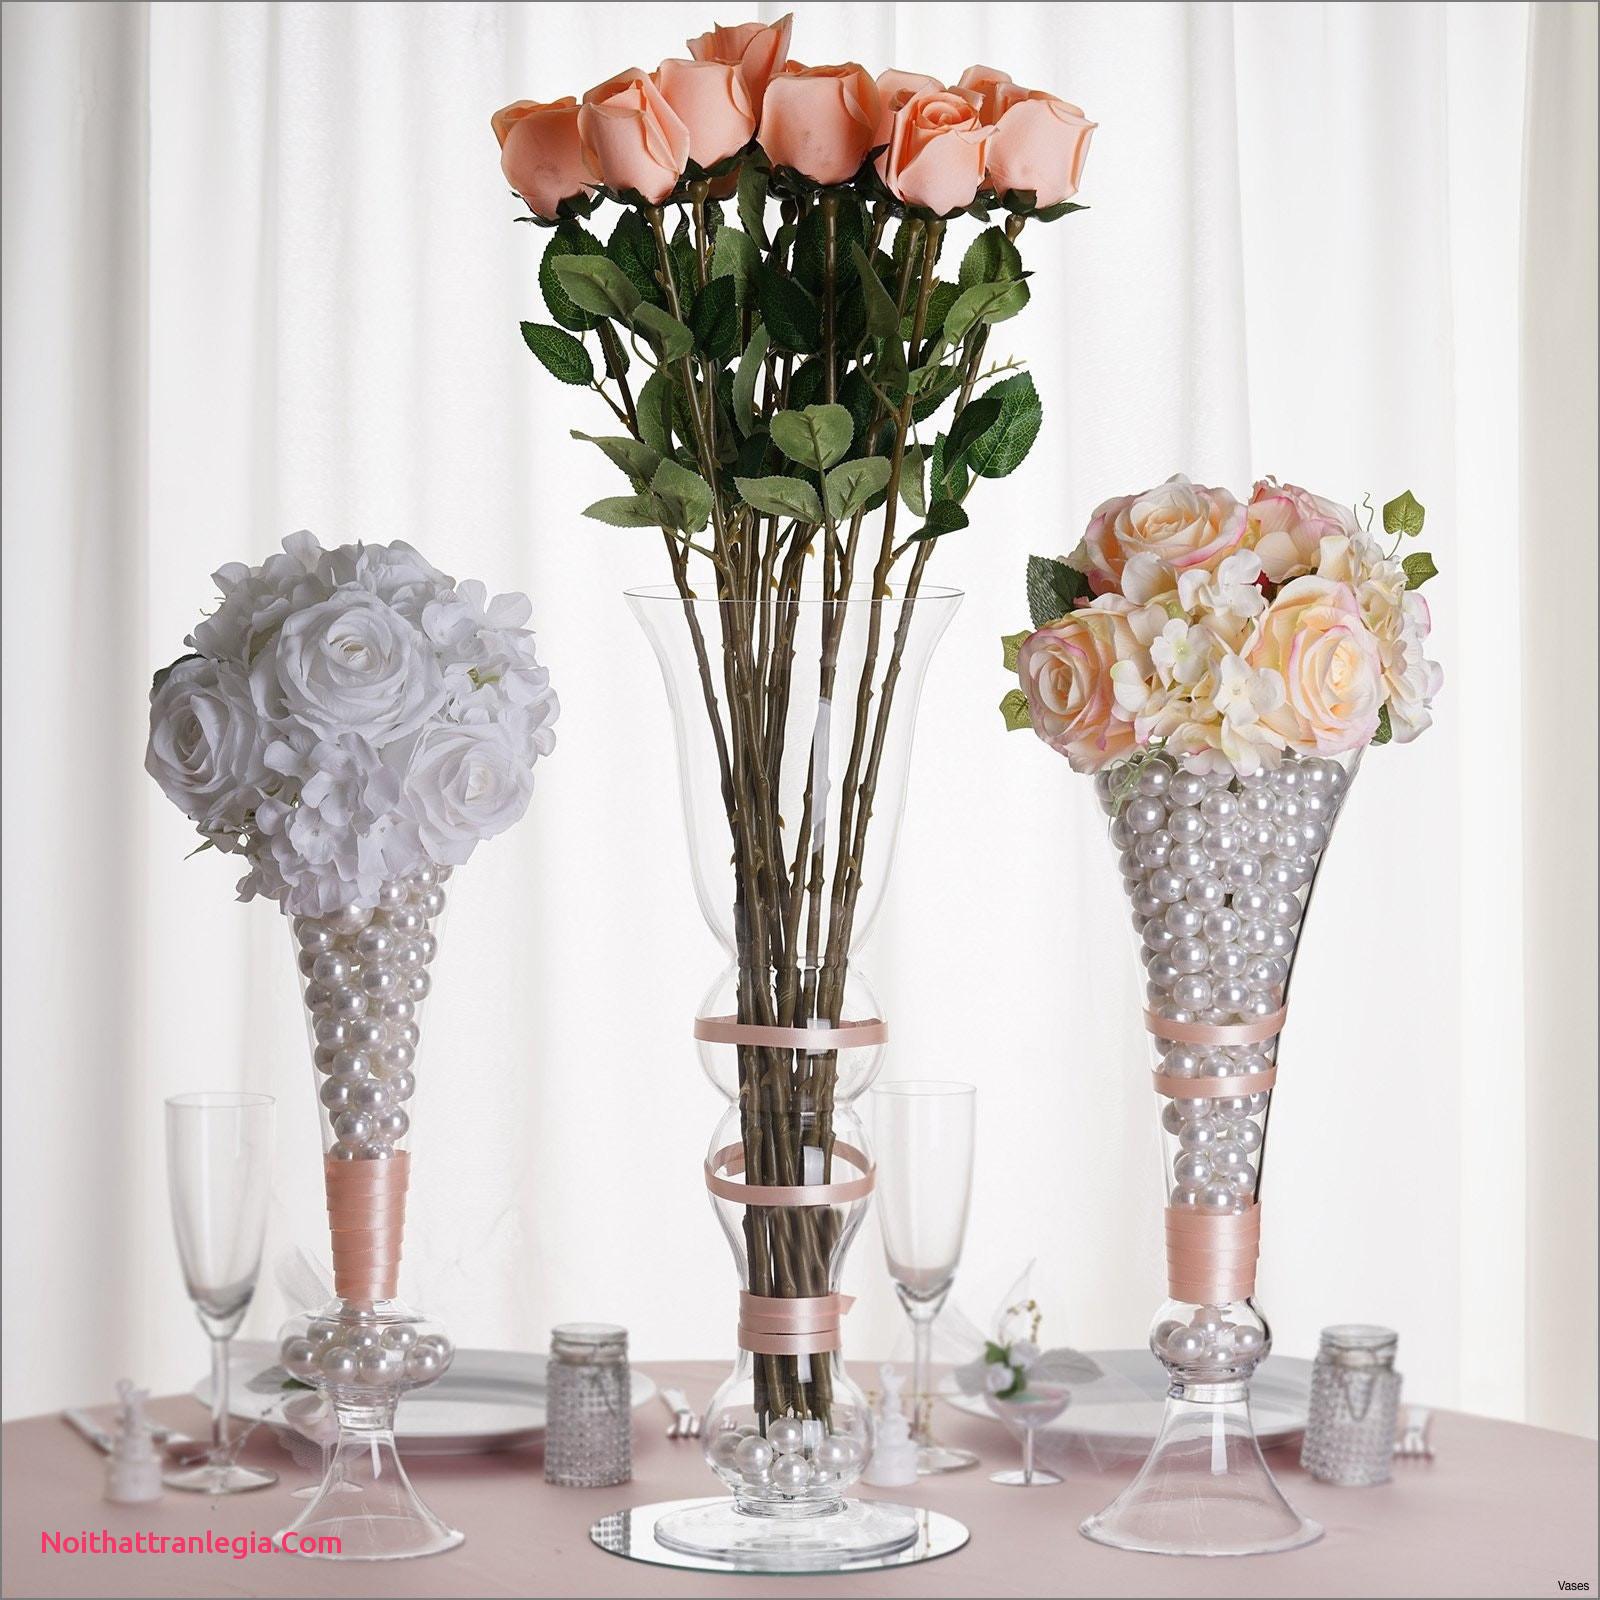 12 Perfect 5ft Vase 2021 free download 5ft vase of 20 how to clean flower vases noithattranlegia vases design regarding update clipart awesome flower vase table 04h vases tablei 0d clipart dining base end design